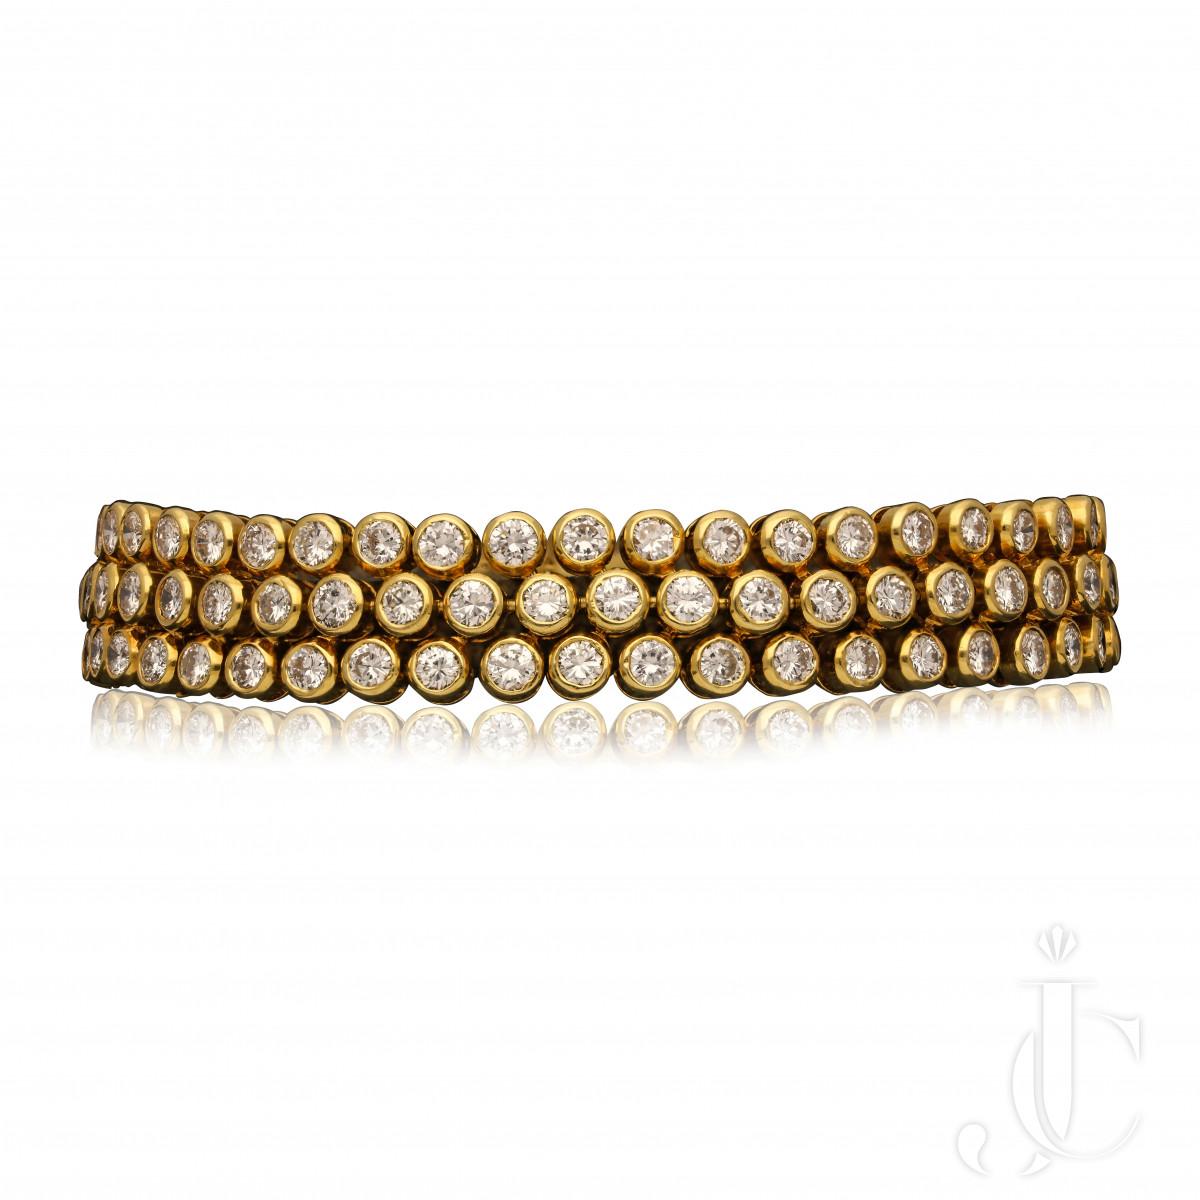 Cartier, Paris - Very Flexible 18ct yg diamond bracelet c.1970s